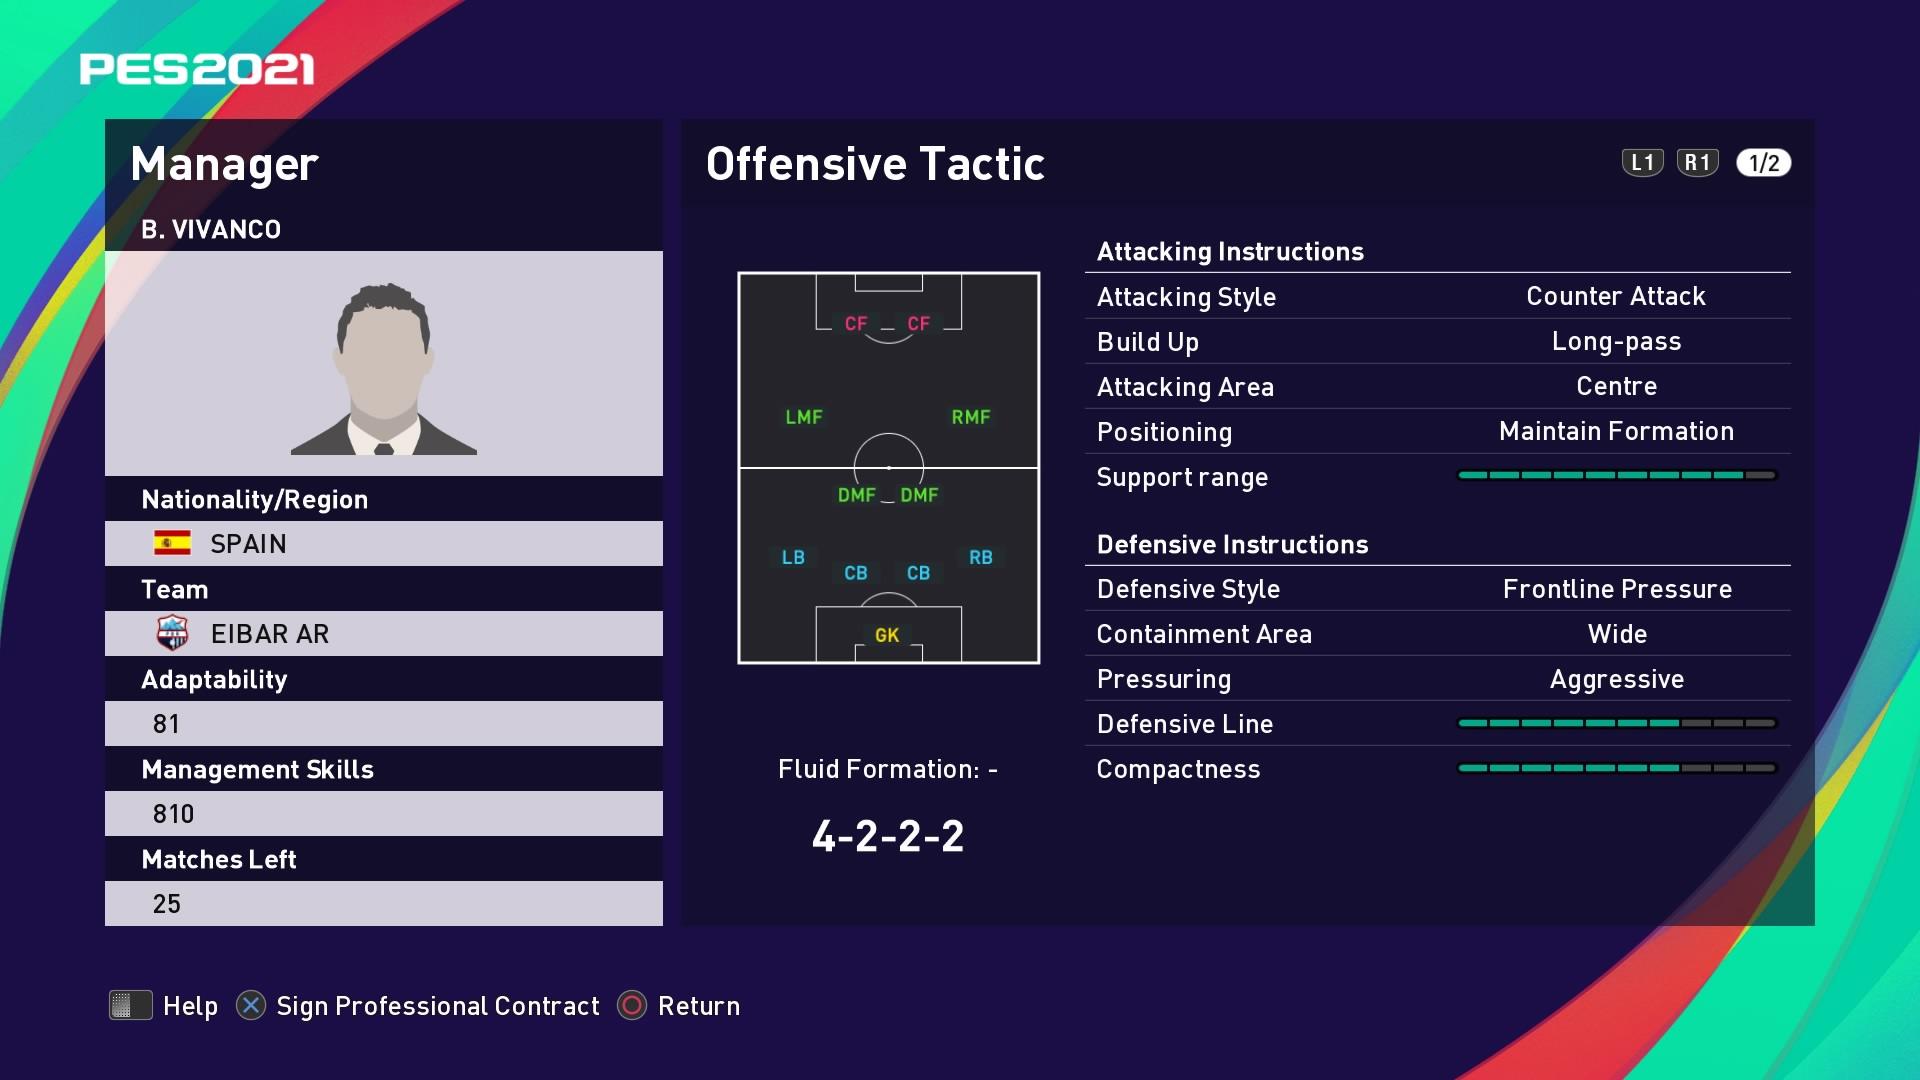 B. Vivanco (José Luis Mendilibar) Offensive Tactic in PES 2021 myClub